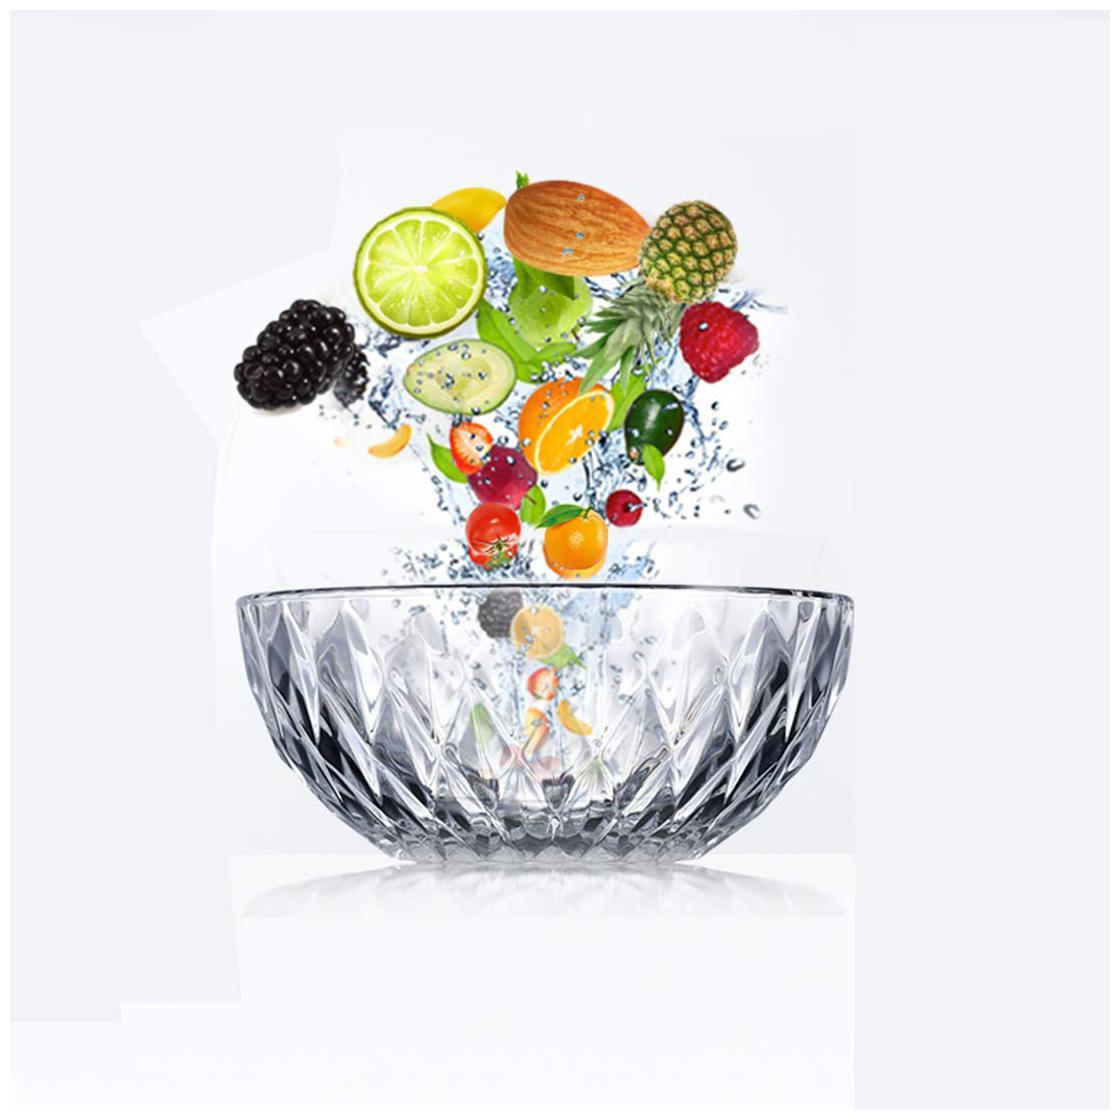 Incrizma Glass Bowl Fruit/Salad/Dessert/Noodle Bowl Set 1600 ml   Set of 2